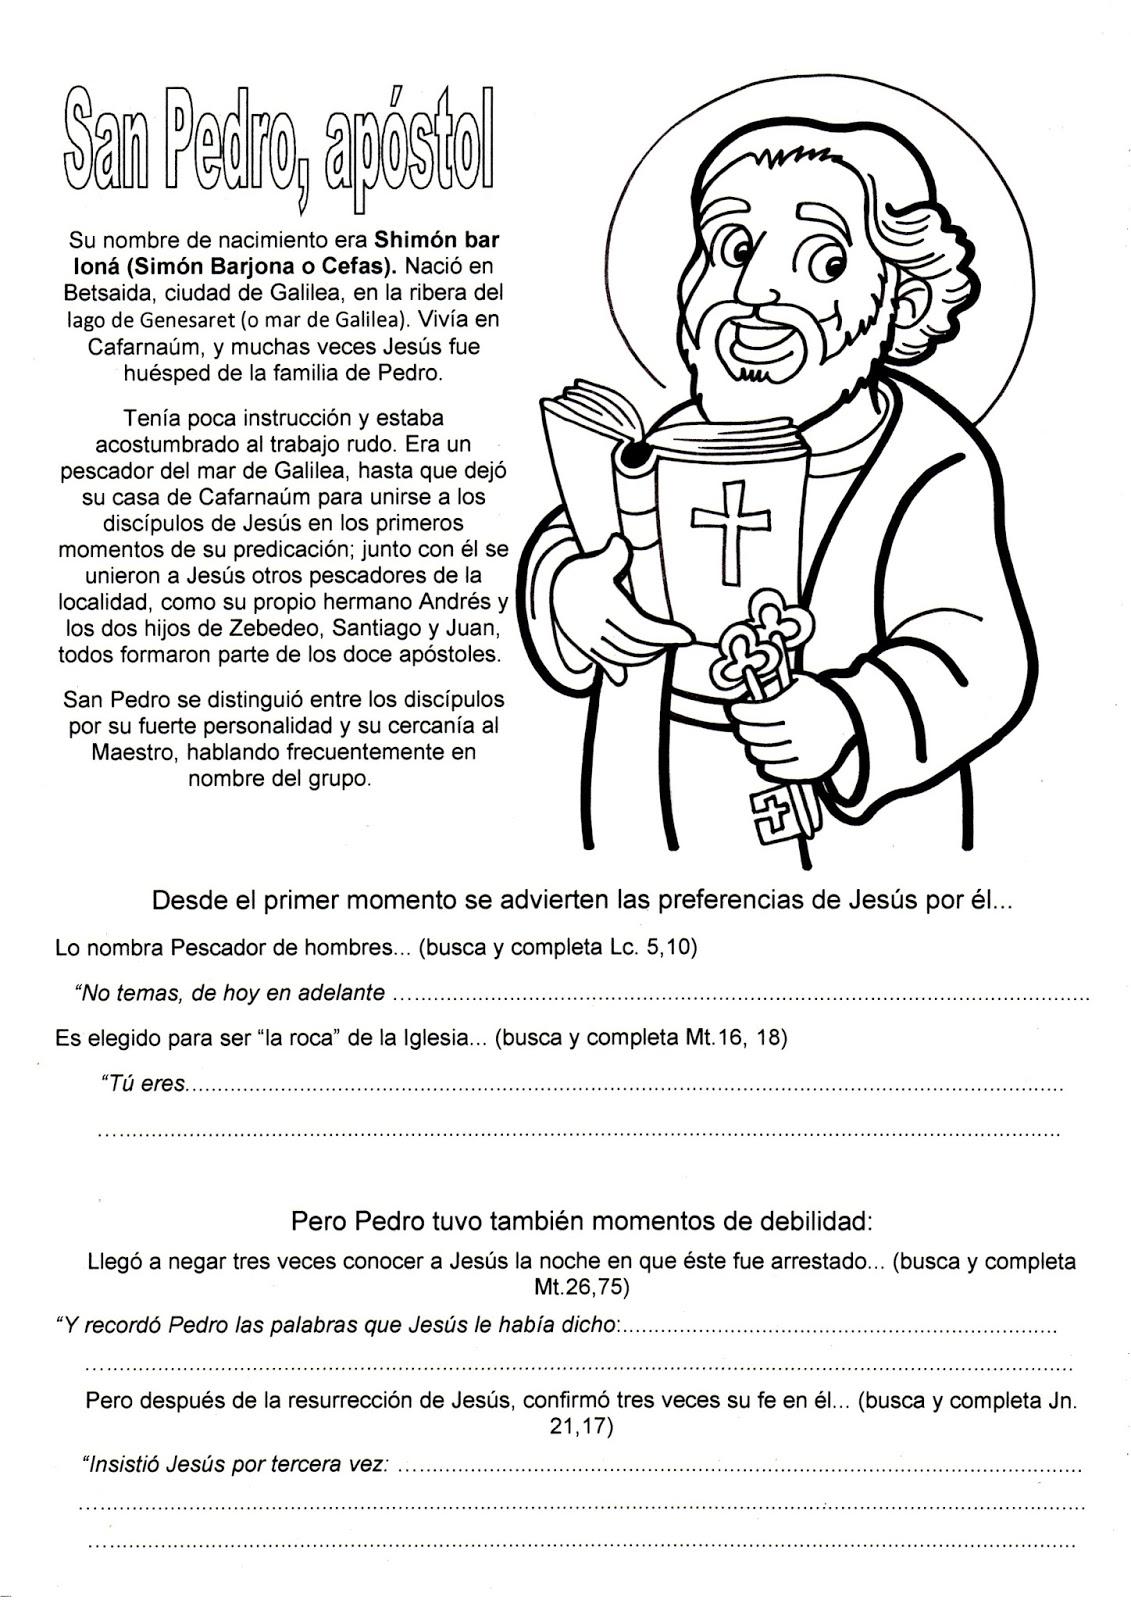 Blog Católico Gotitas Espirituales ®: EL APÓSTOL SAN PEDRO PARA COLOREAR